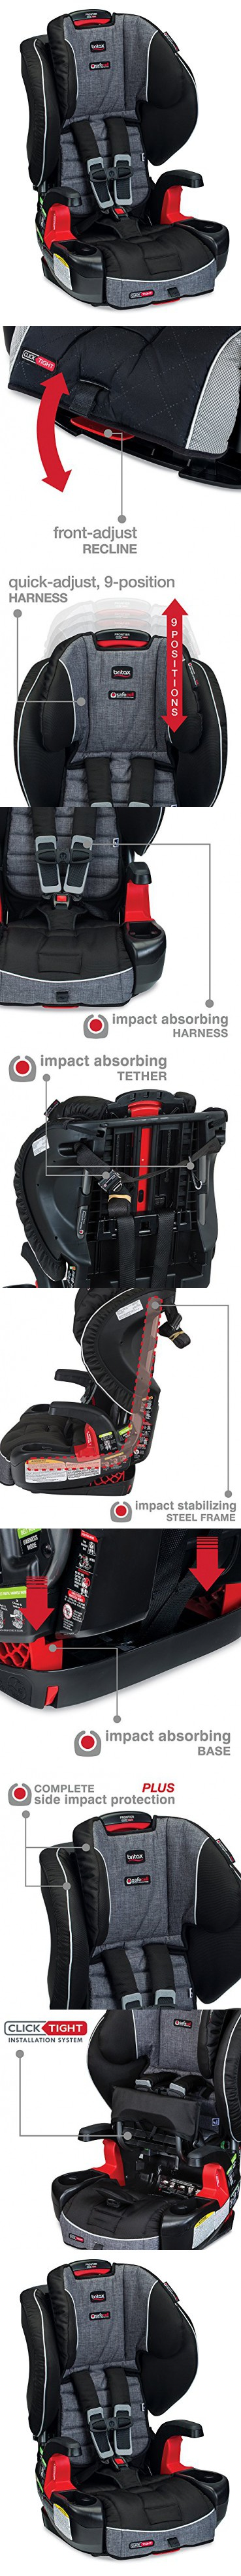 Britax G1.1 Frontier Clicktight Combination Harness2